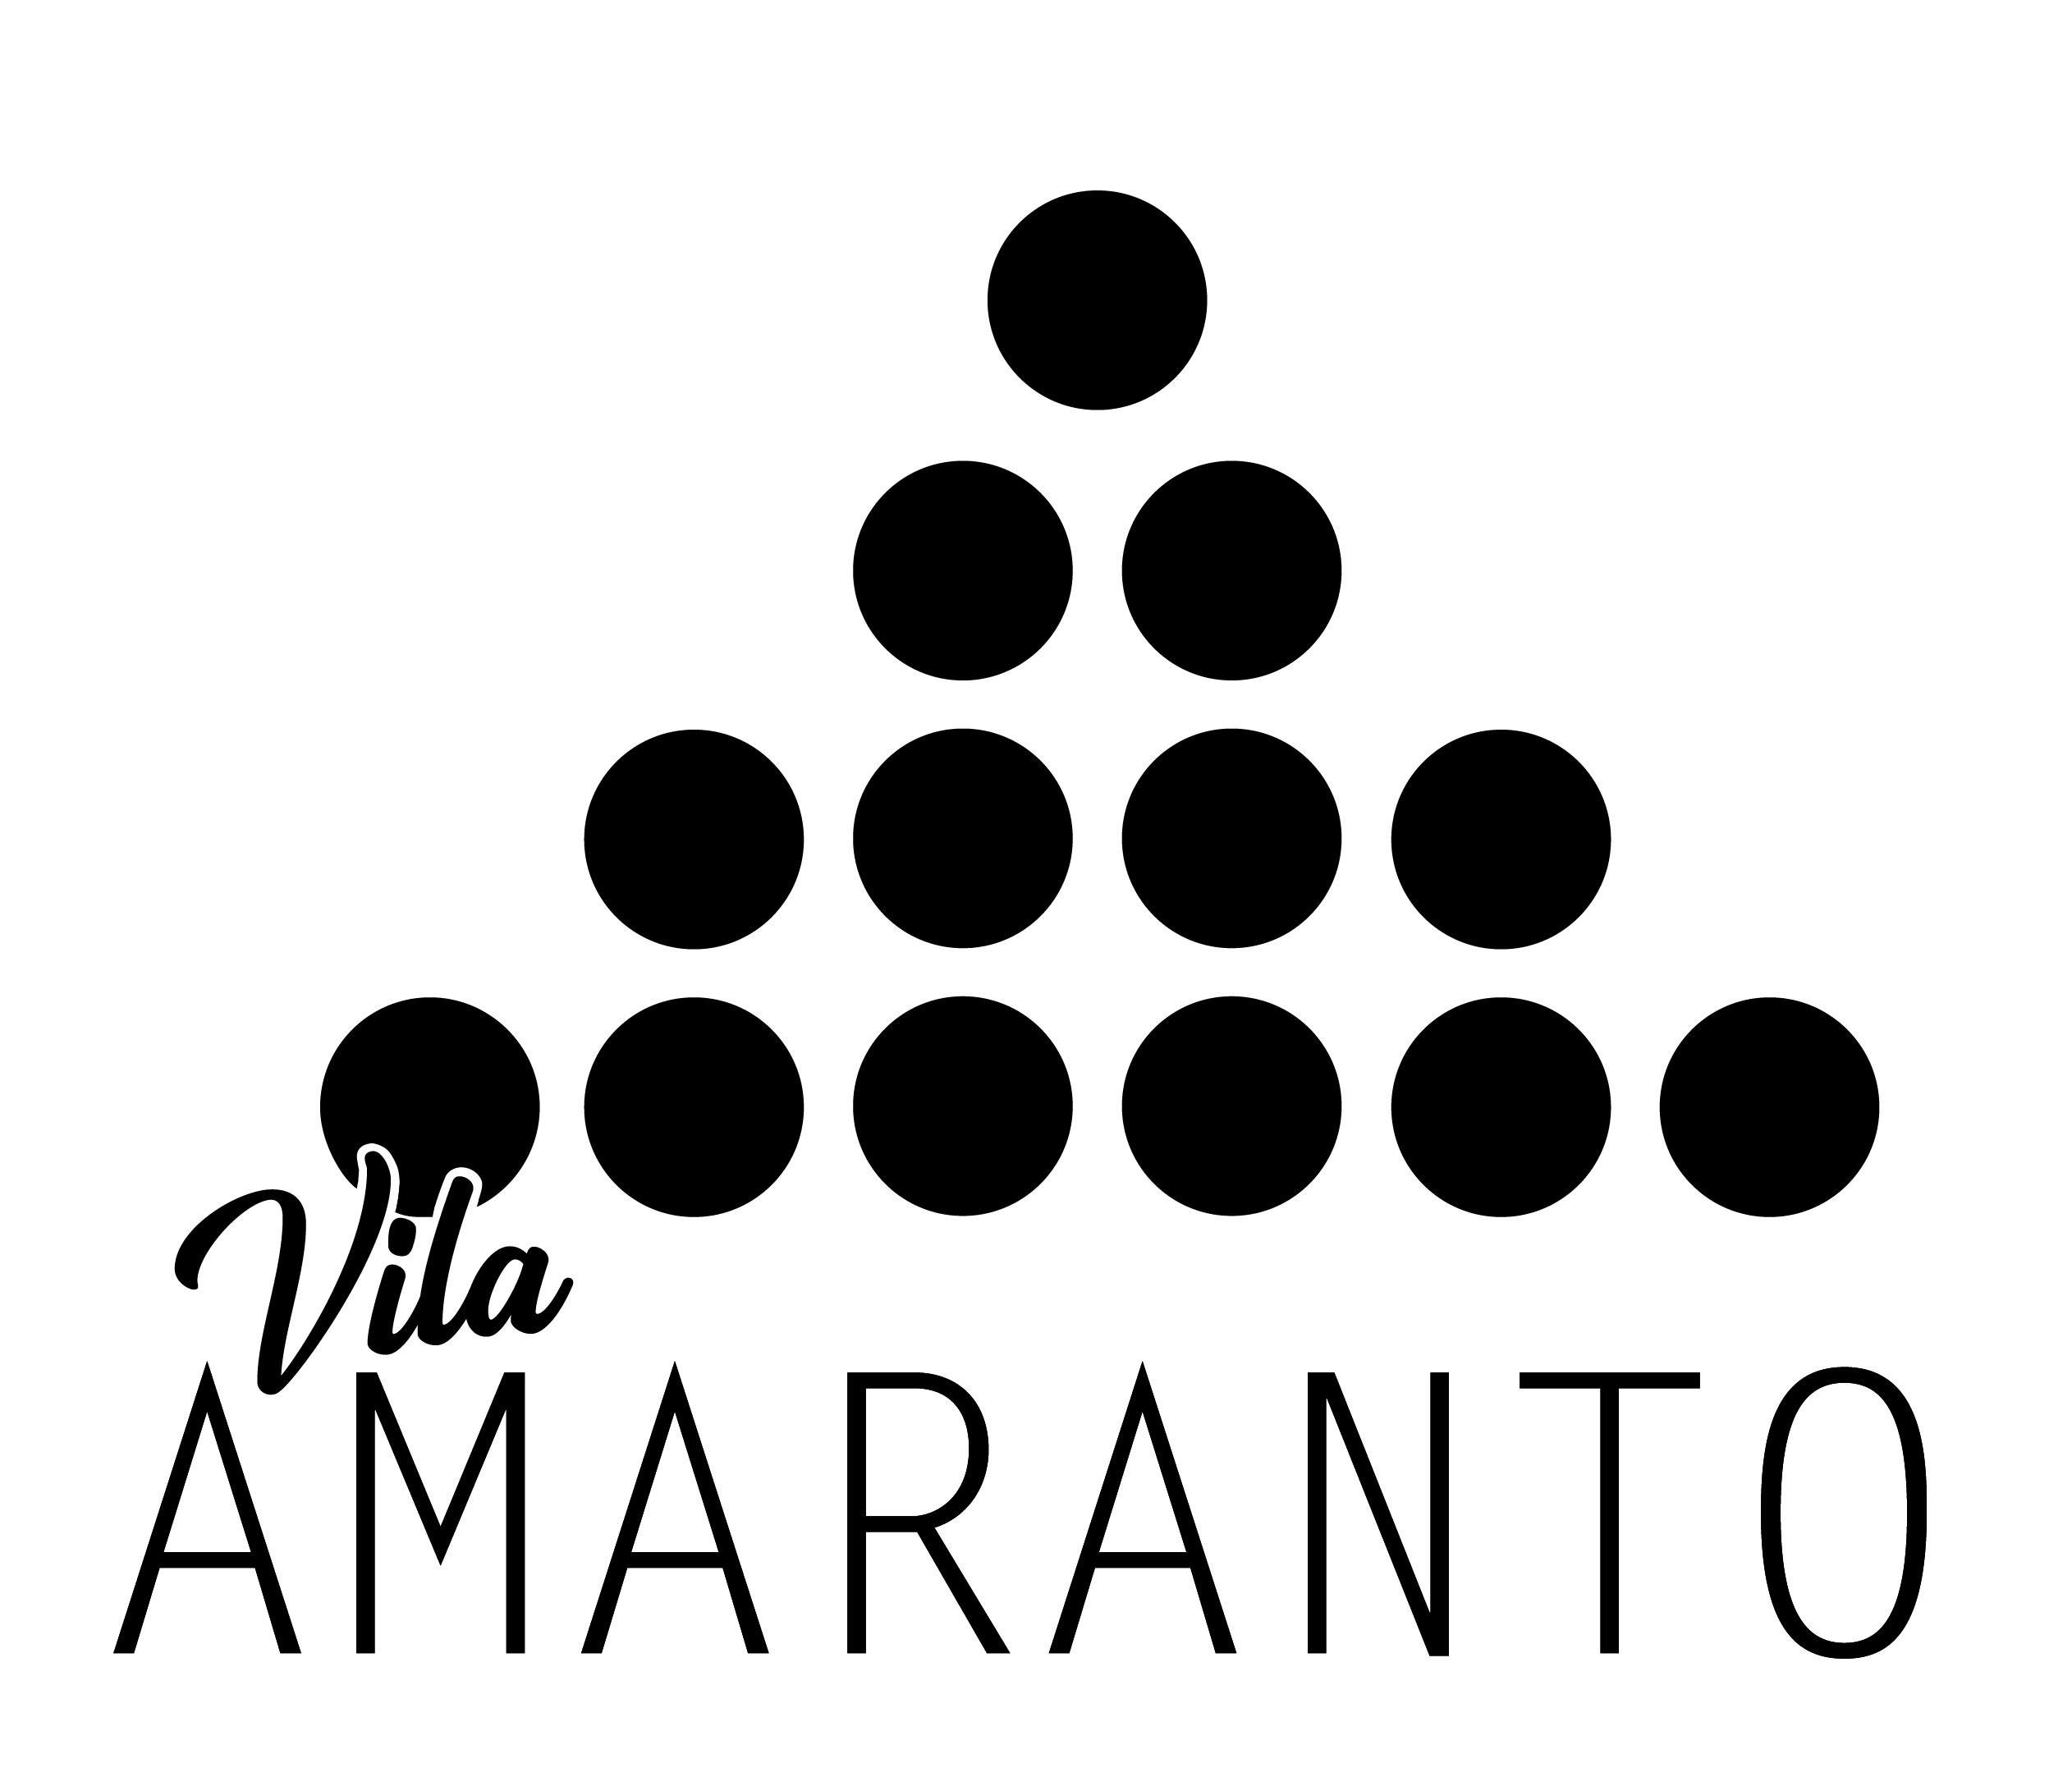 Vila Amaranto